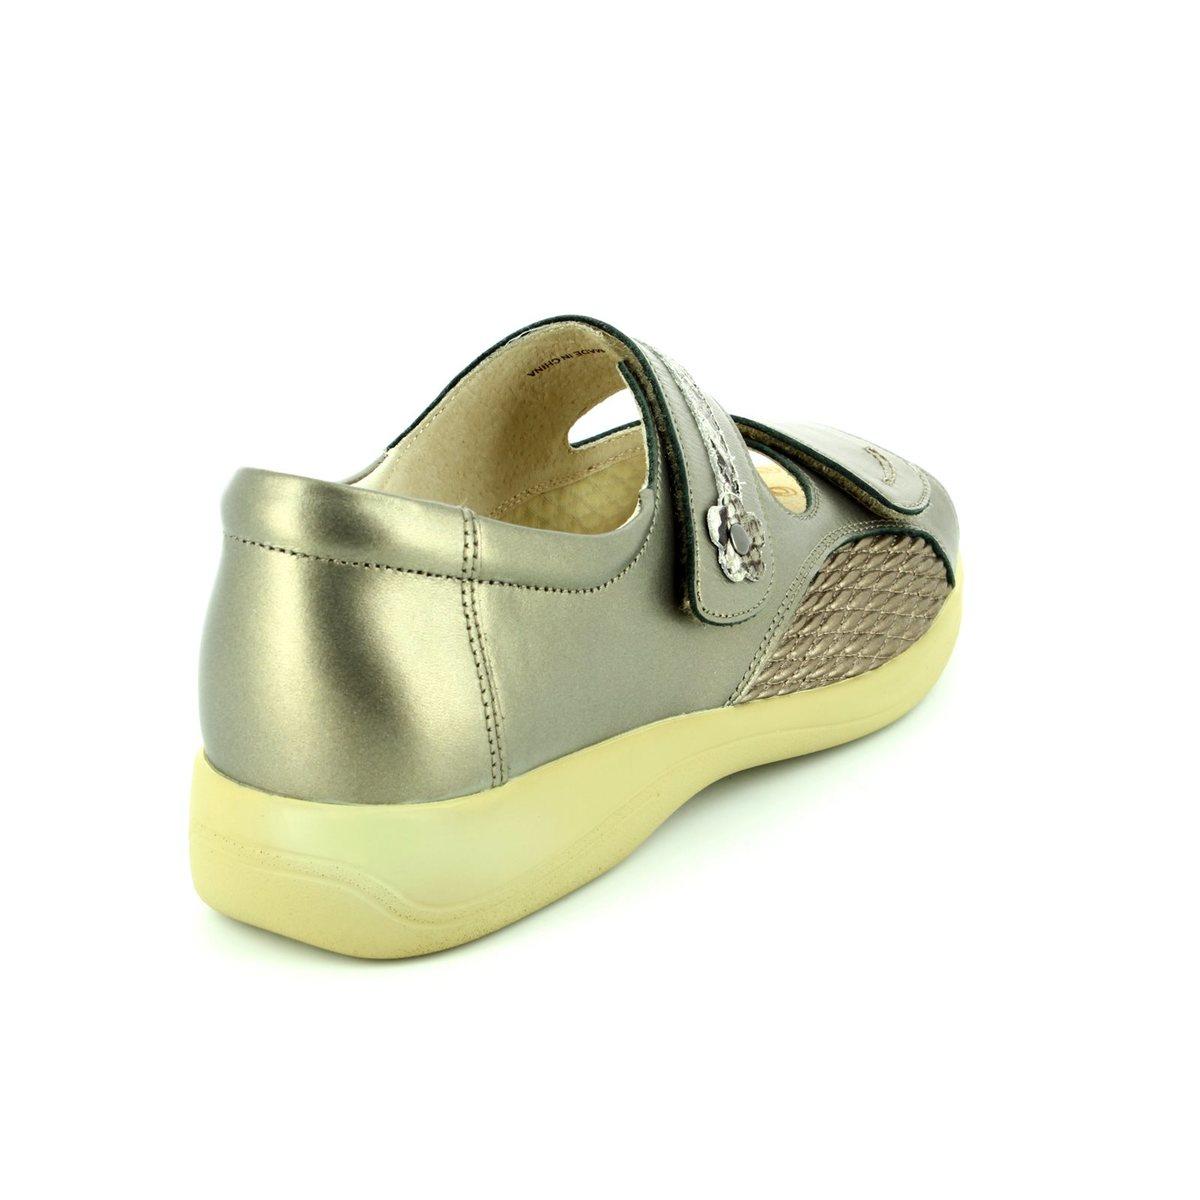 Eeee Womens Shoes